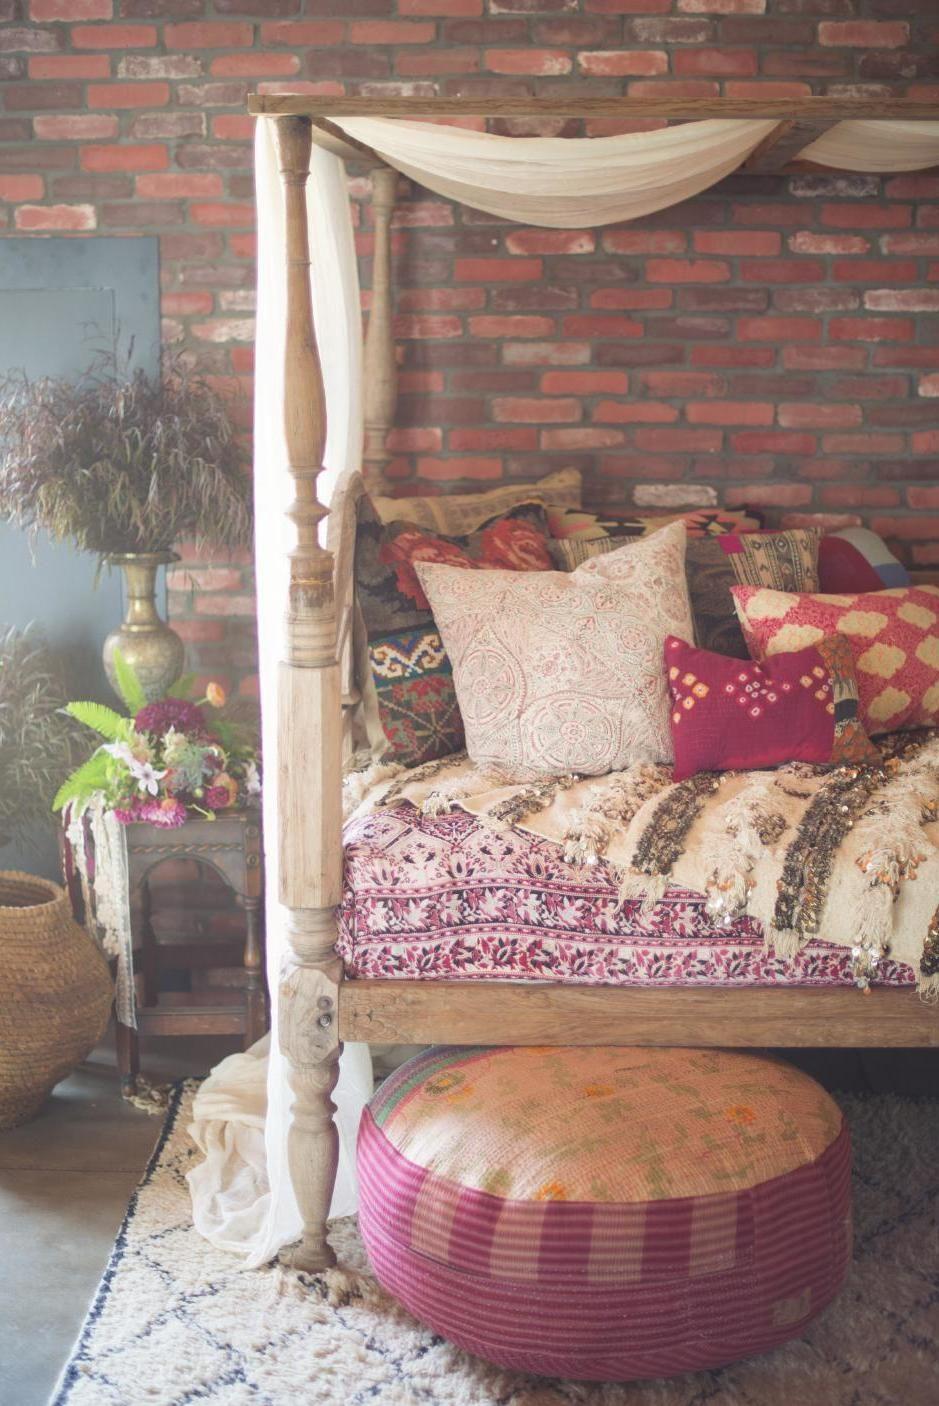 Romance Romantic Bedroom Ideas: Home Decor, Bedroom Decor, Home